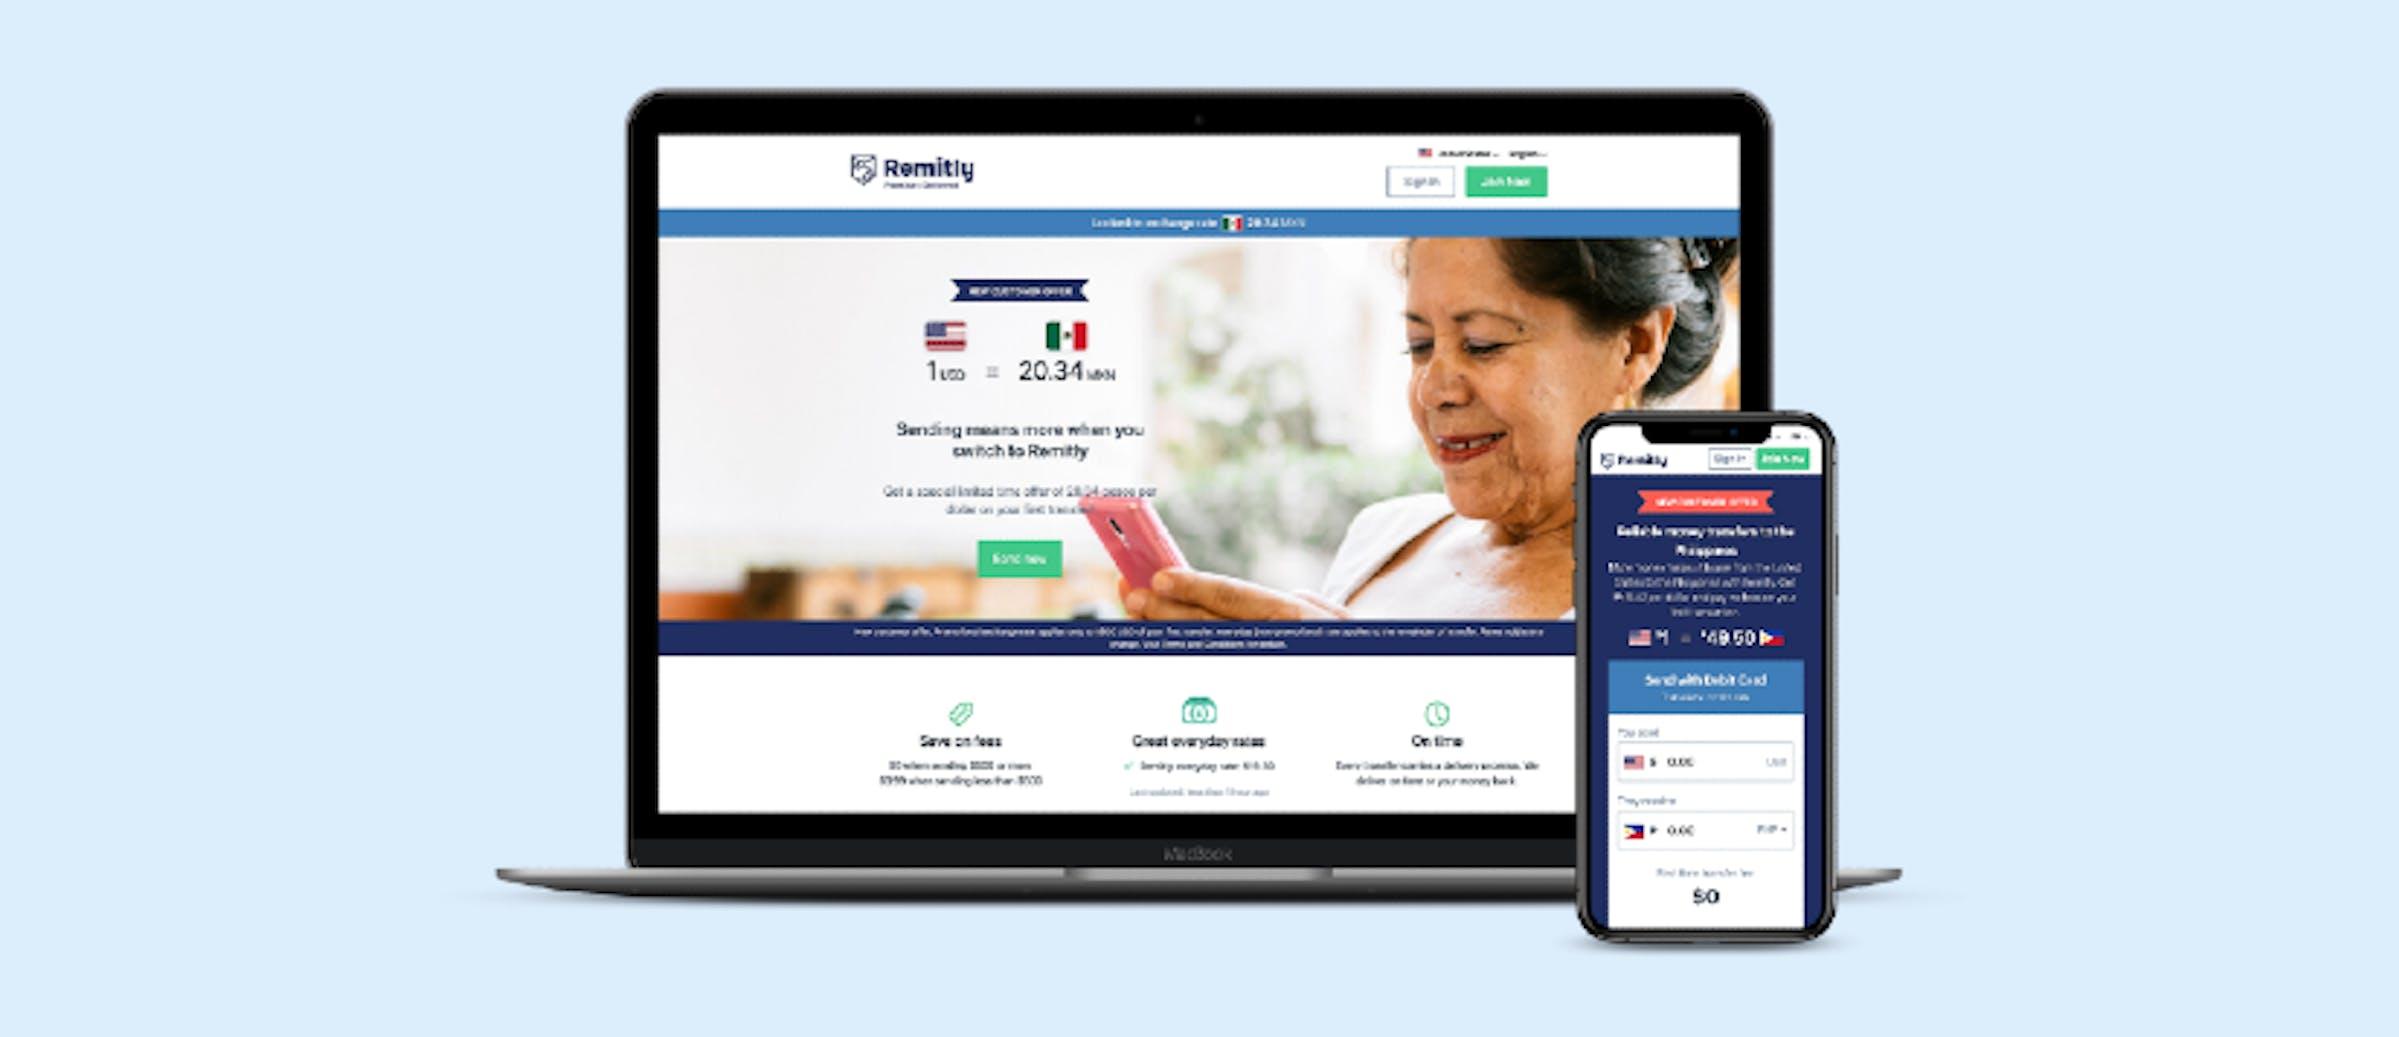 Remitly's mobile and desktop websites